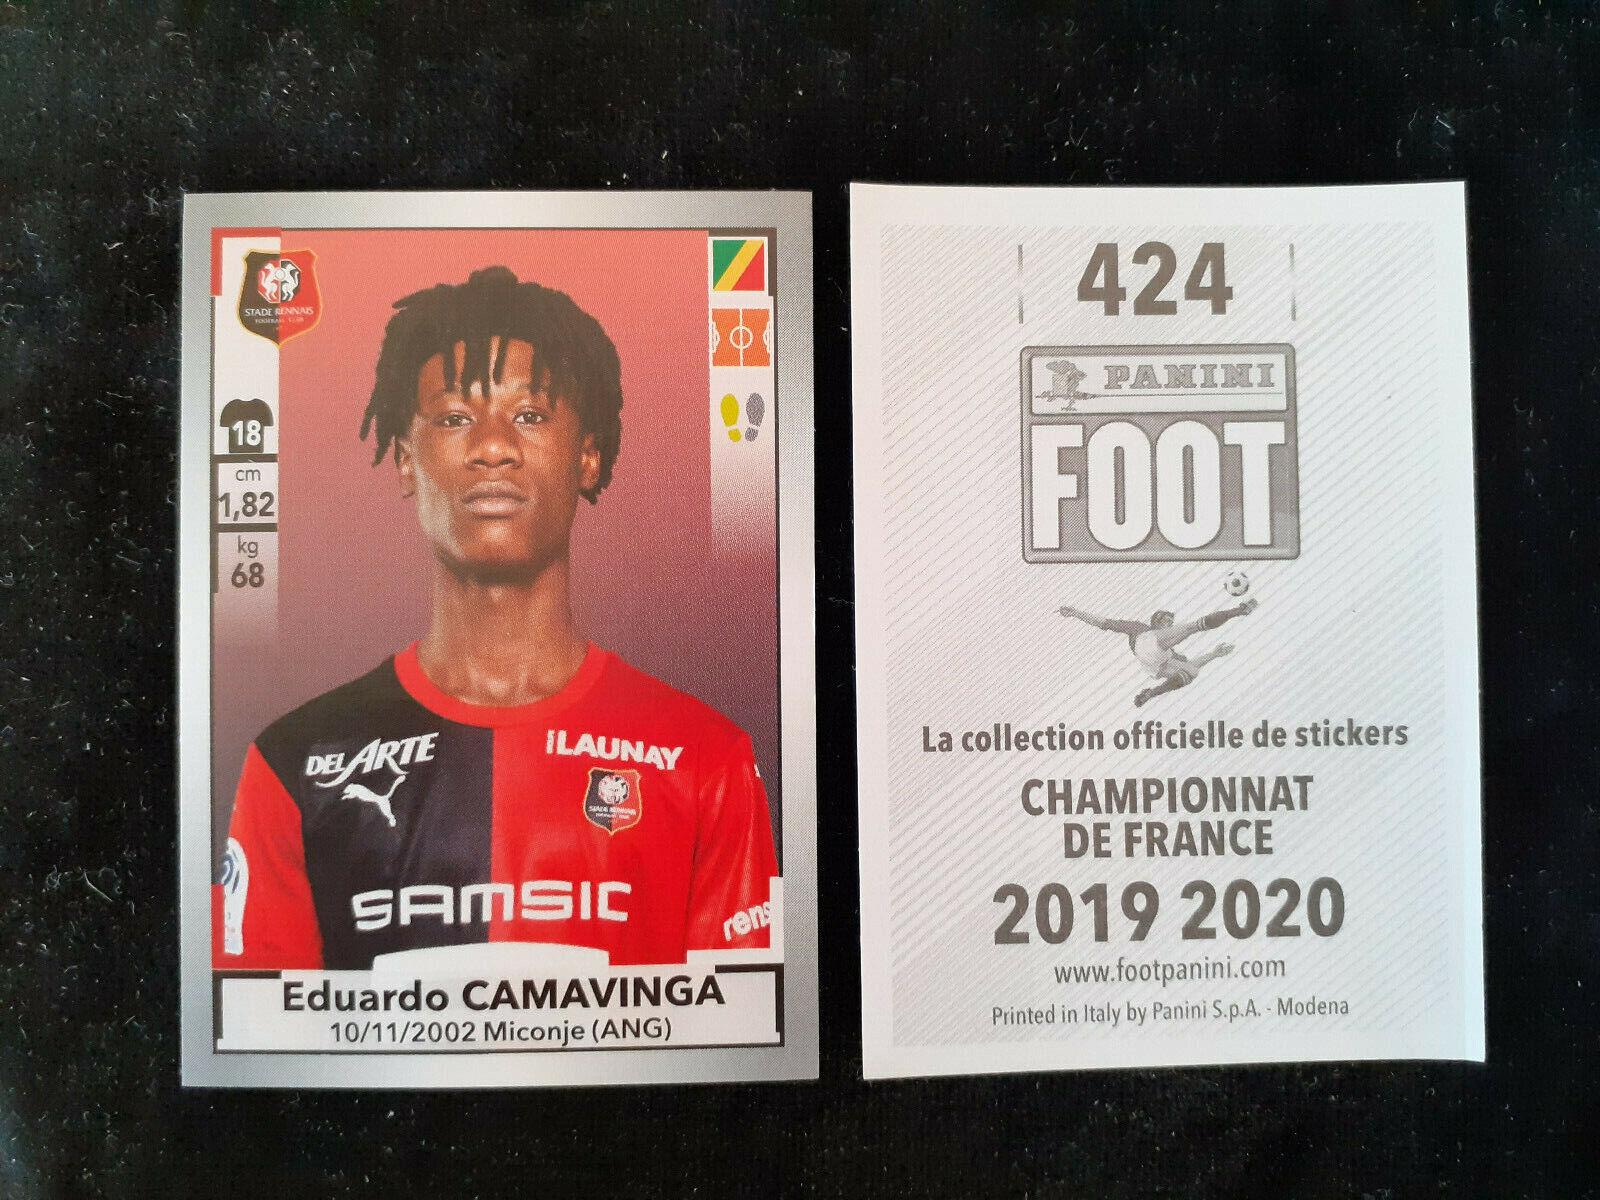 Eduardo camavinga rookie 424 sticker rennes panini foot 2019-20 france team